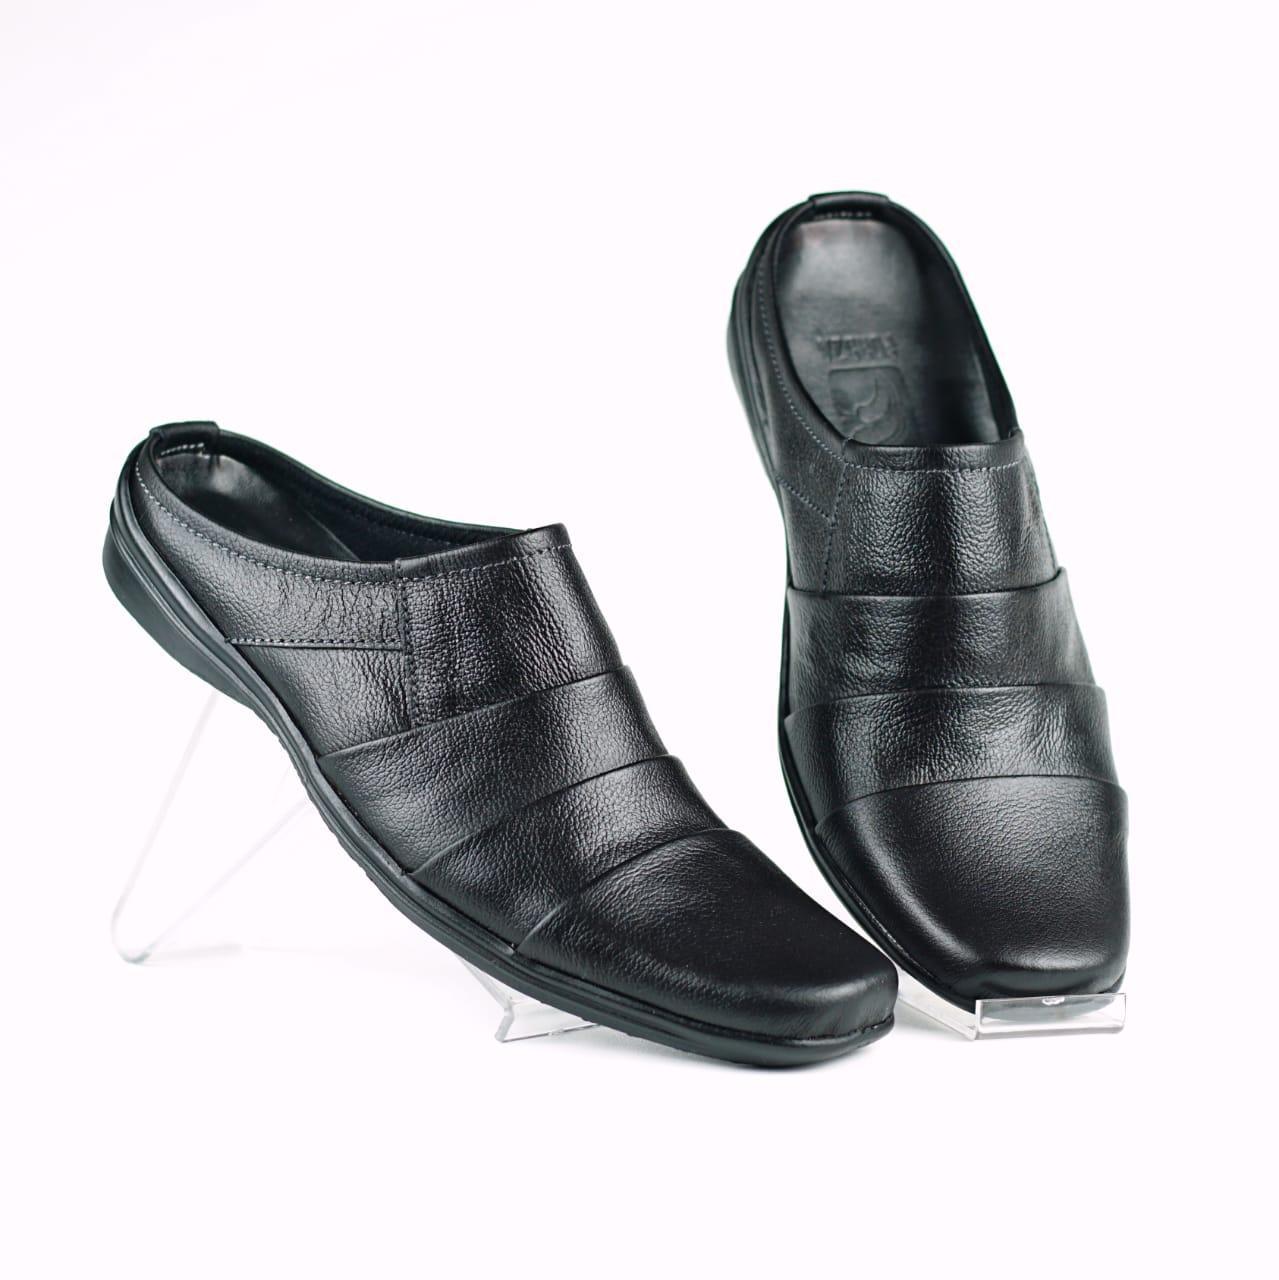 Sepatu Slop Pria Bustong Slip On Kulit Asli Ar04 By Fordza.